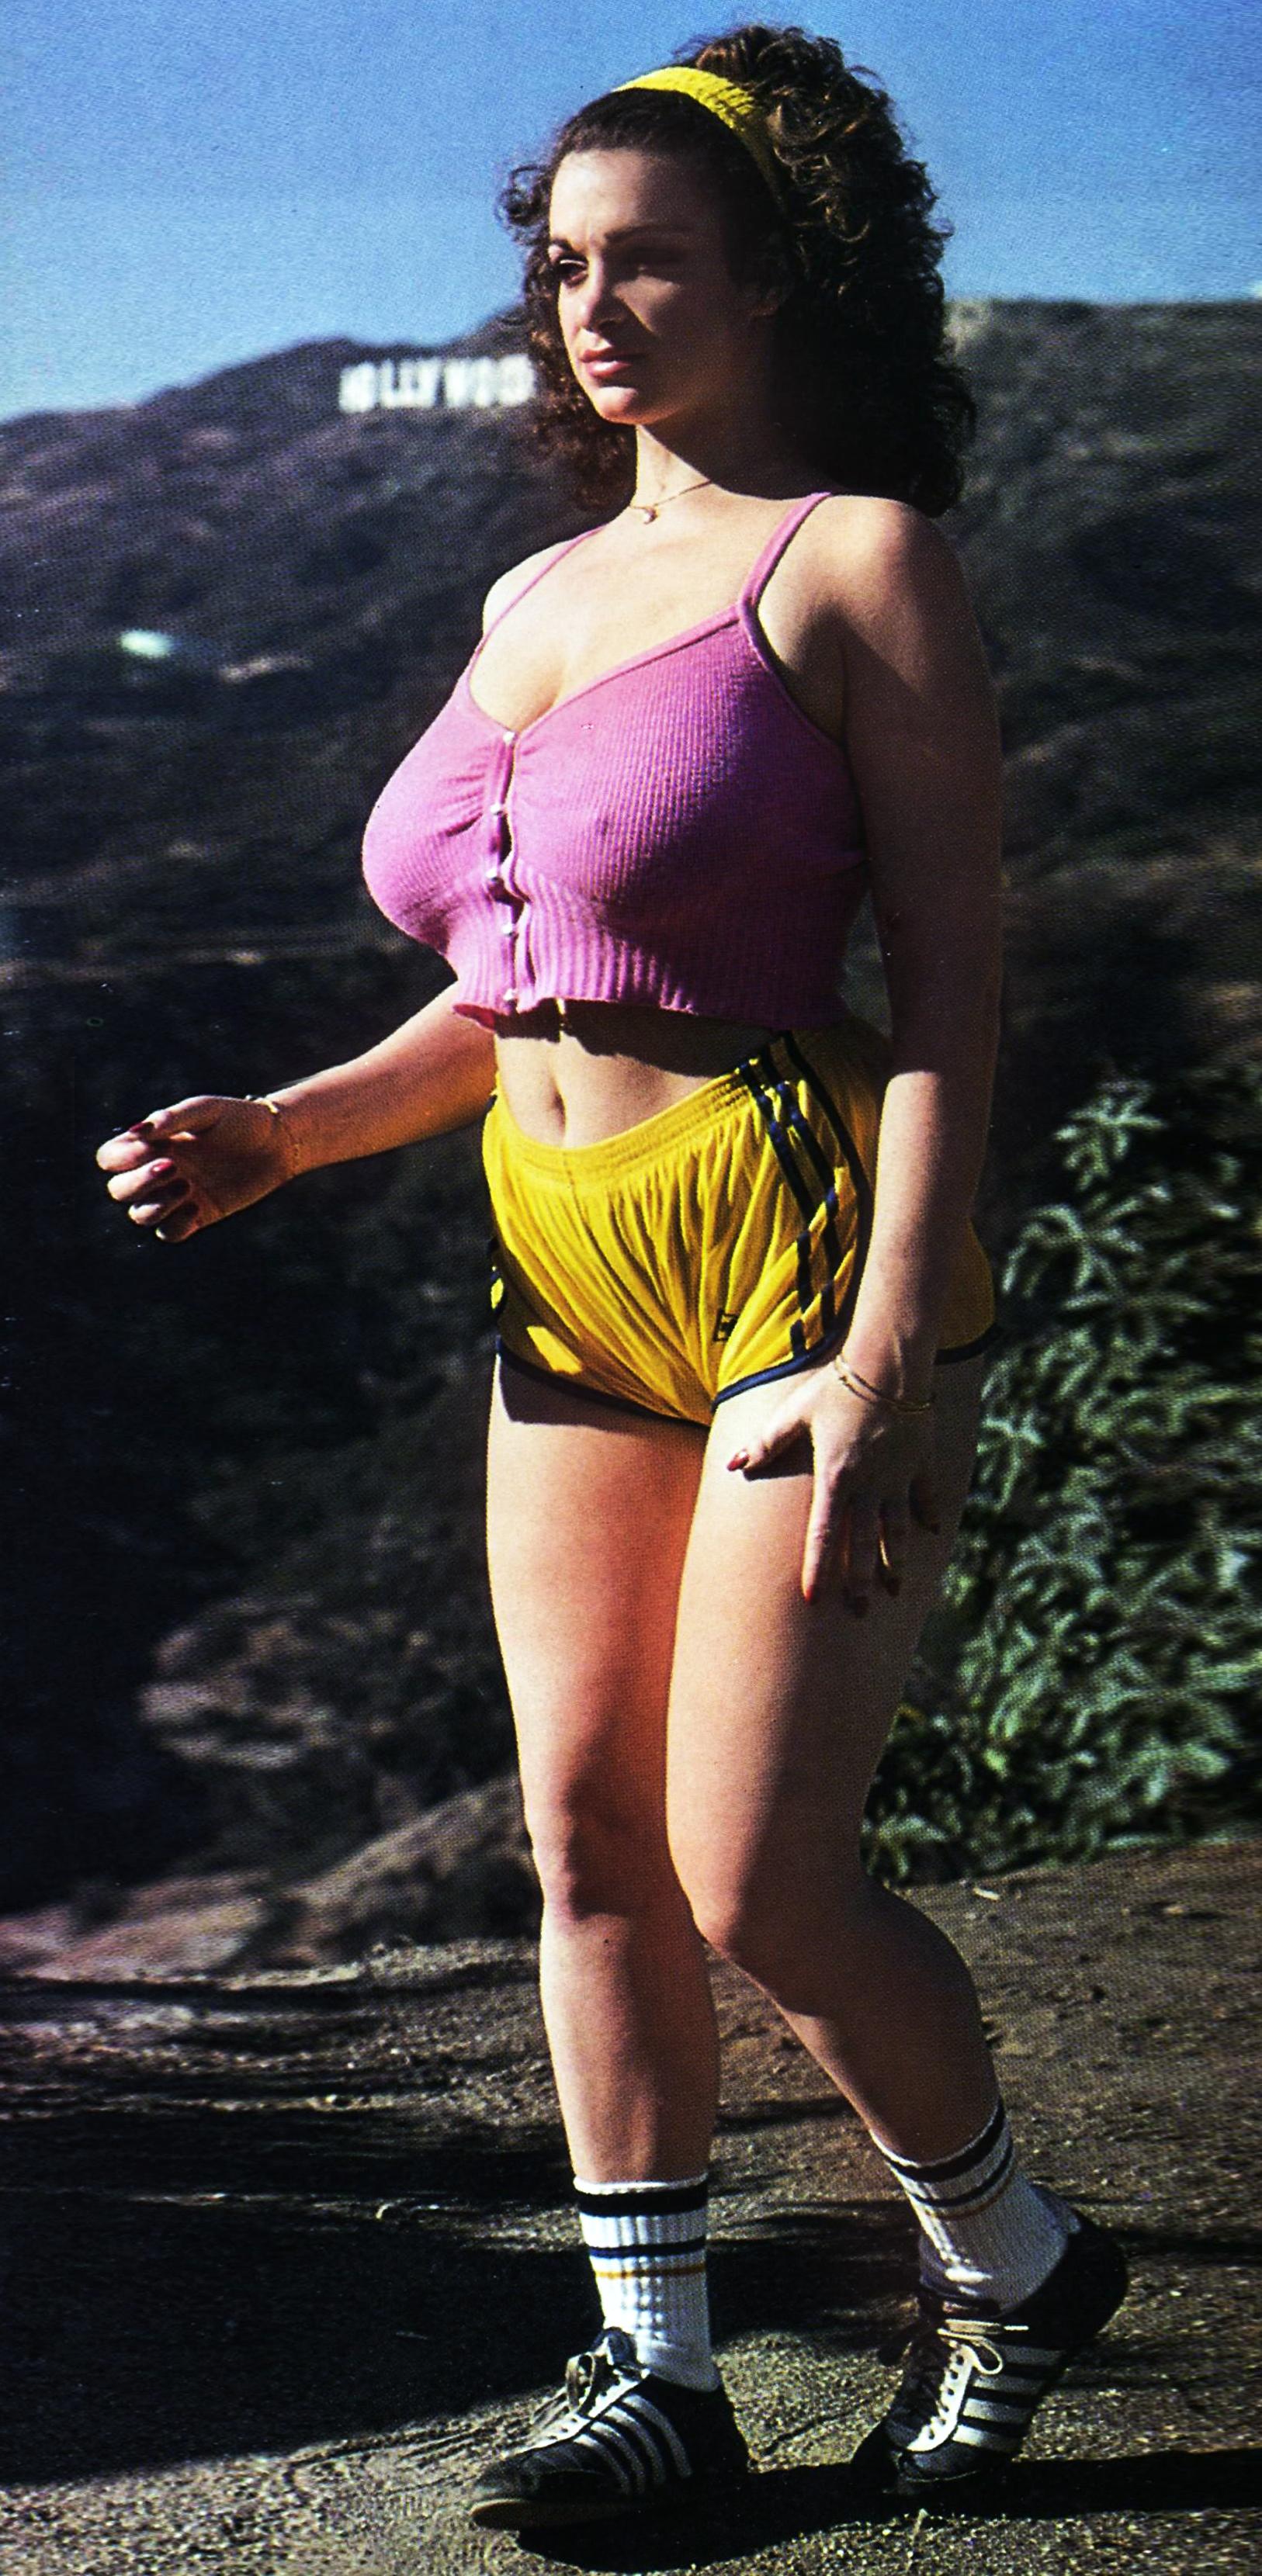 Jewish Porn Star Sue Nero Susan Nero 01.JPG